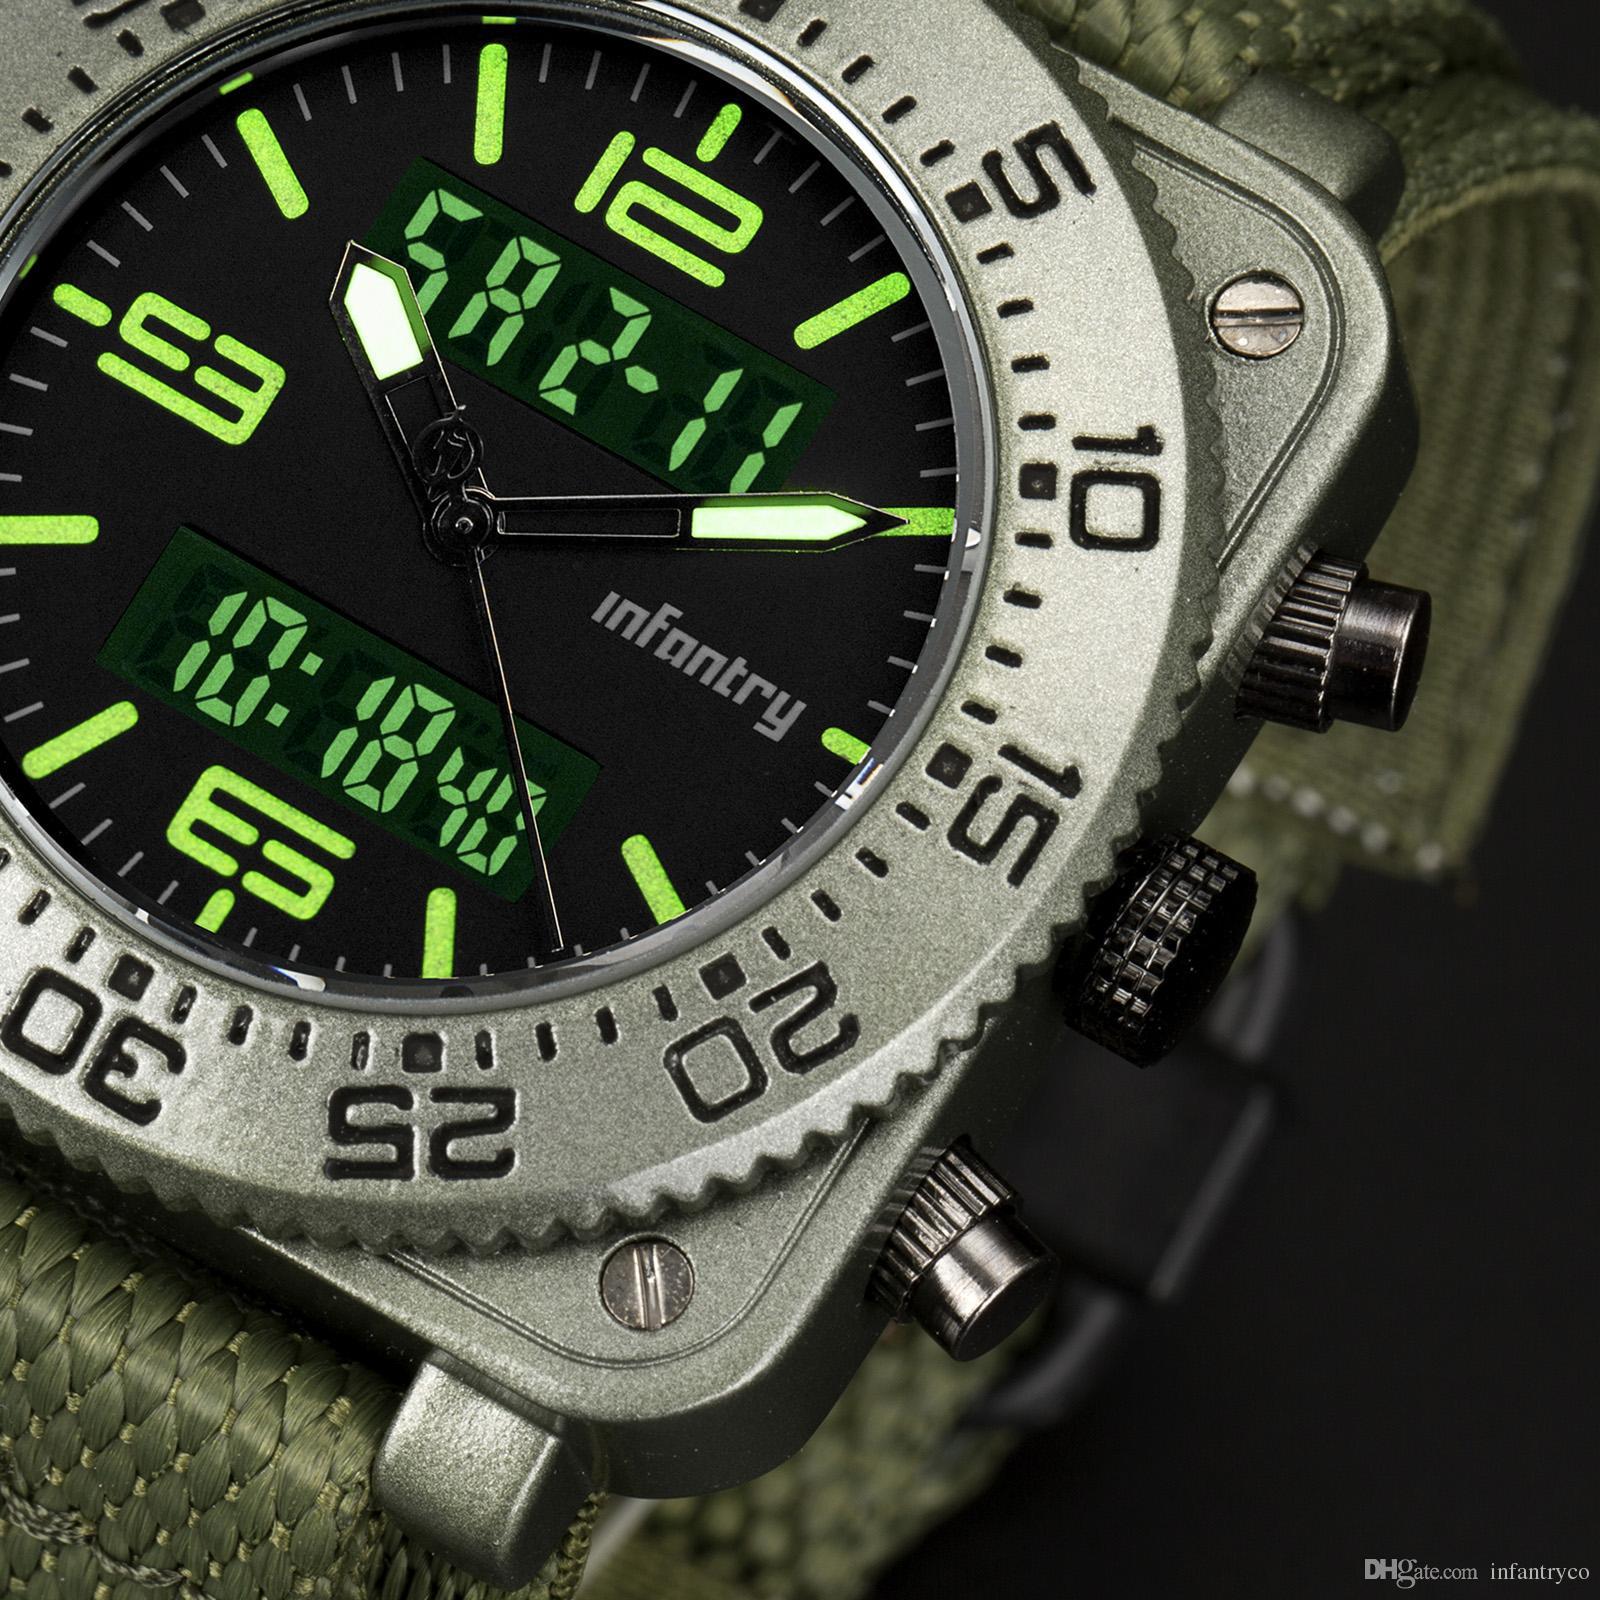 31ea9ed8af31 INFANTRY Famous Brand Mens LED Digital Quartz Wrist Watch Fashion Sport  Watches Military Wristwatch Chronograph Nylon Strap Montre Homme Cool  Watches Swiss ...